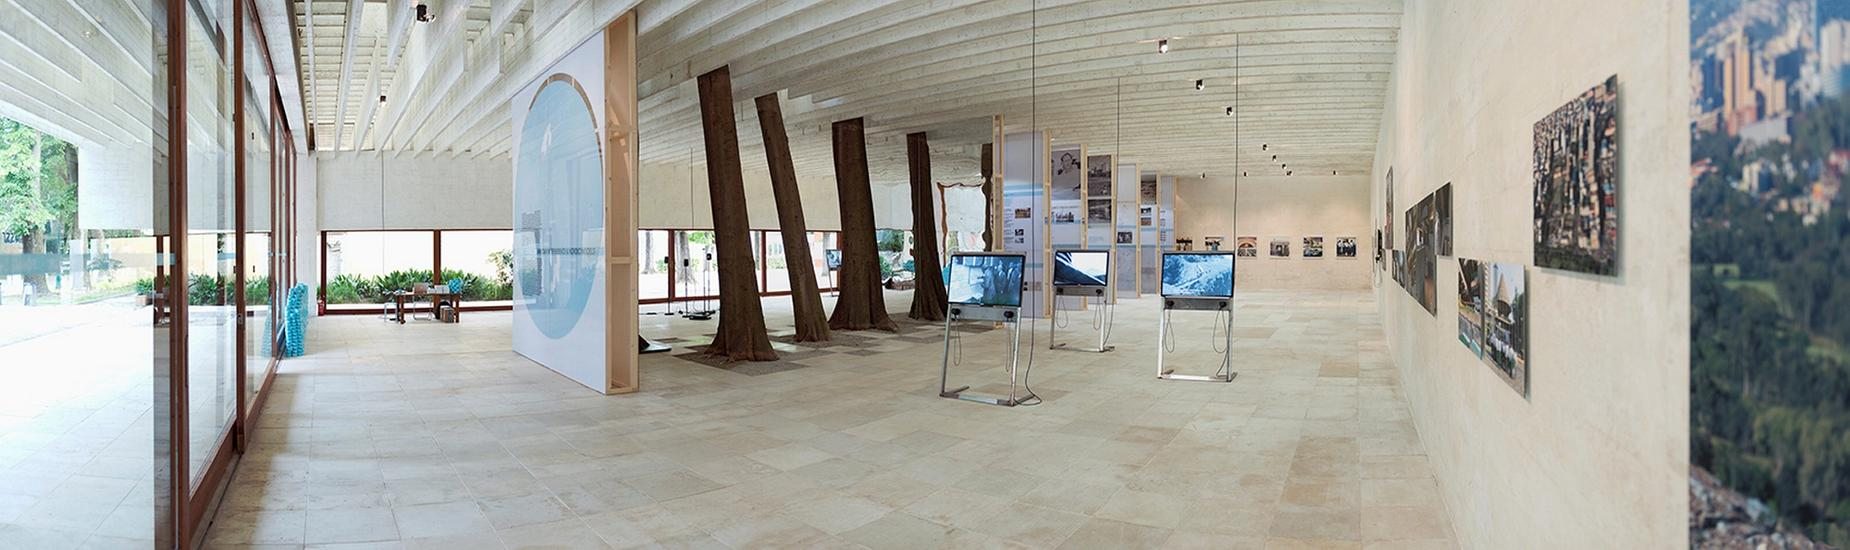 Annar Bjørgli, Nasjonalmuseet